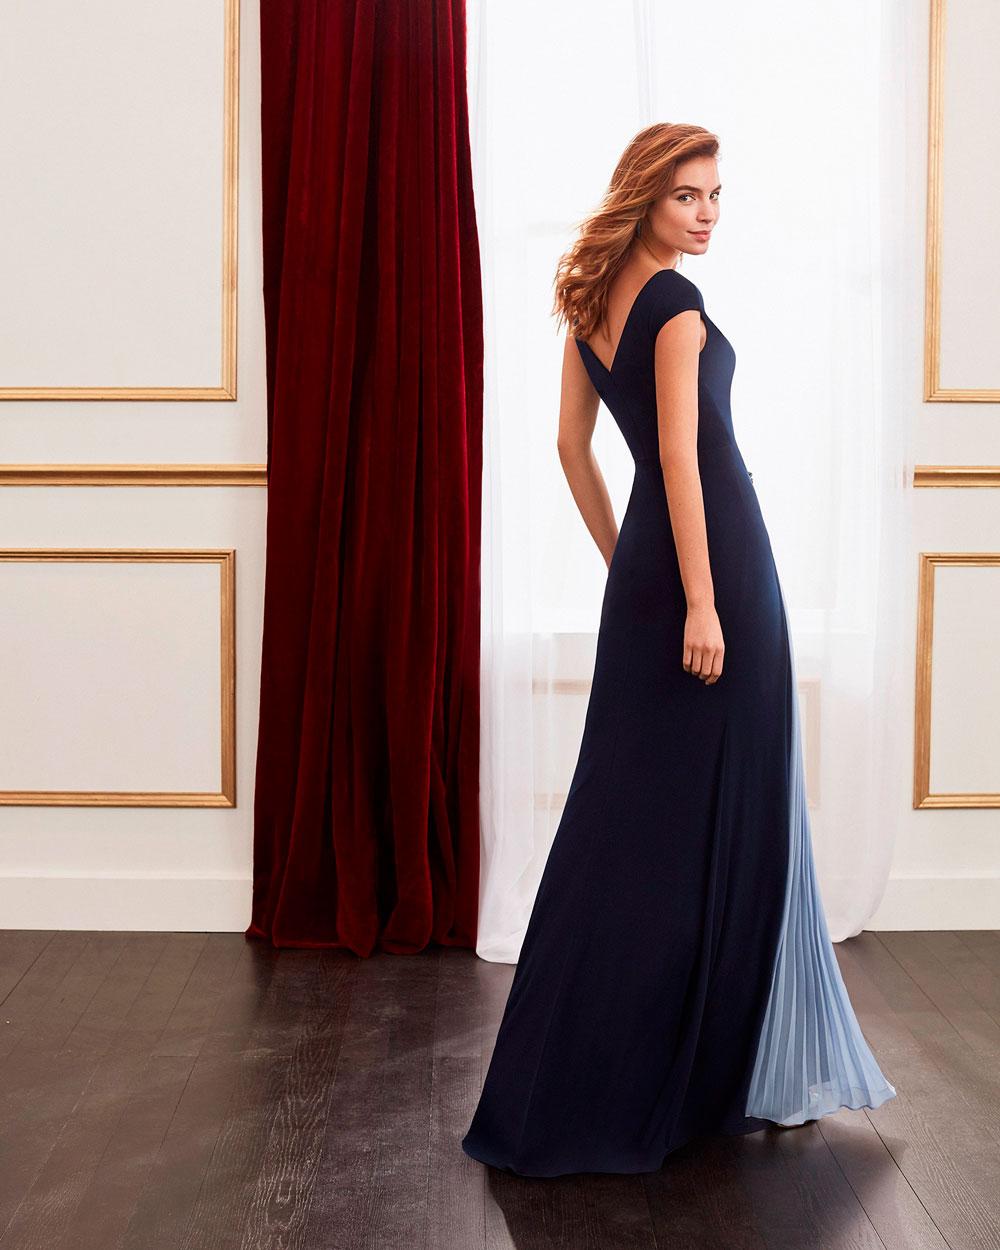 vestido de fiesta 2020 4J139 MARFIL BARCELONA 2